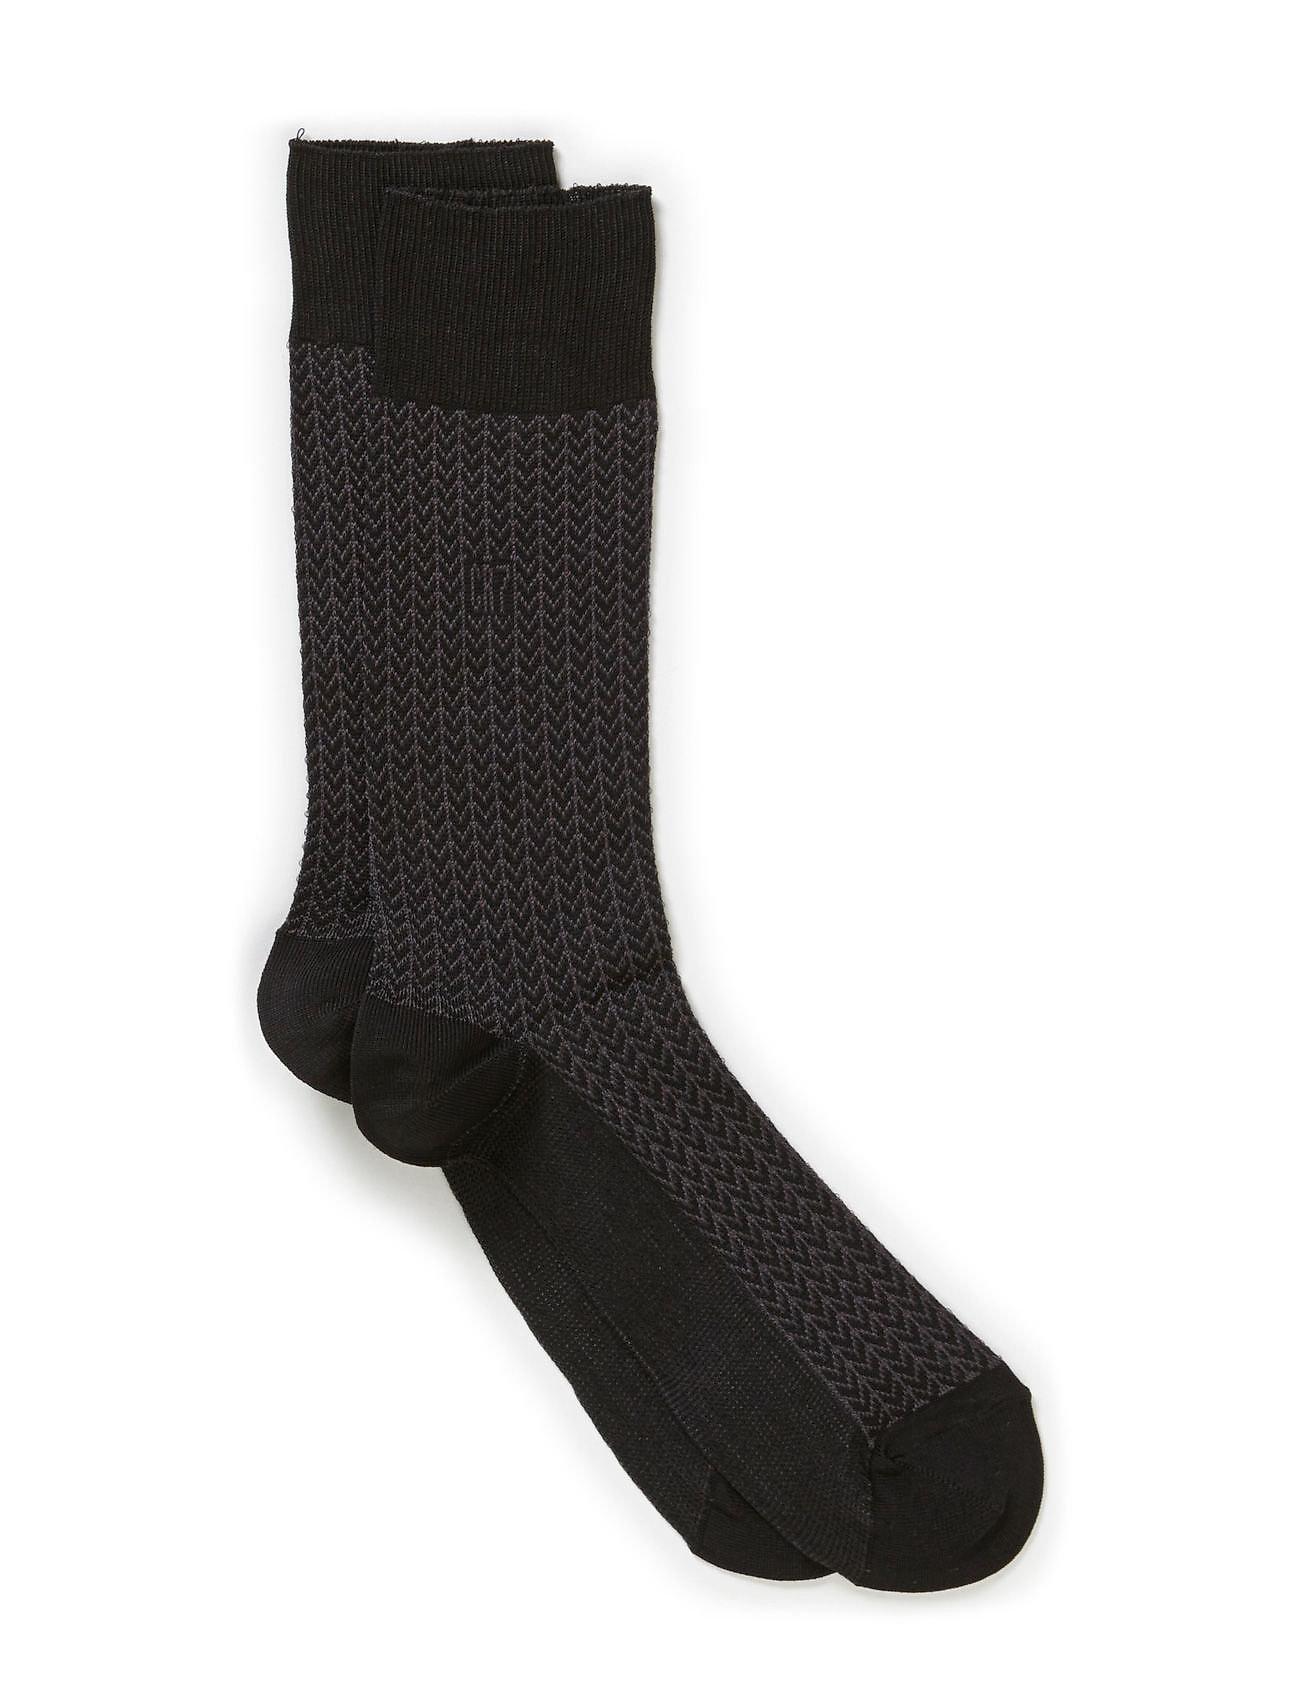 CR7 Luxury sock